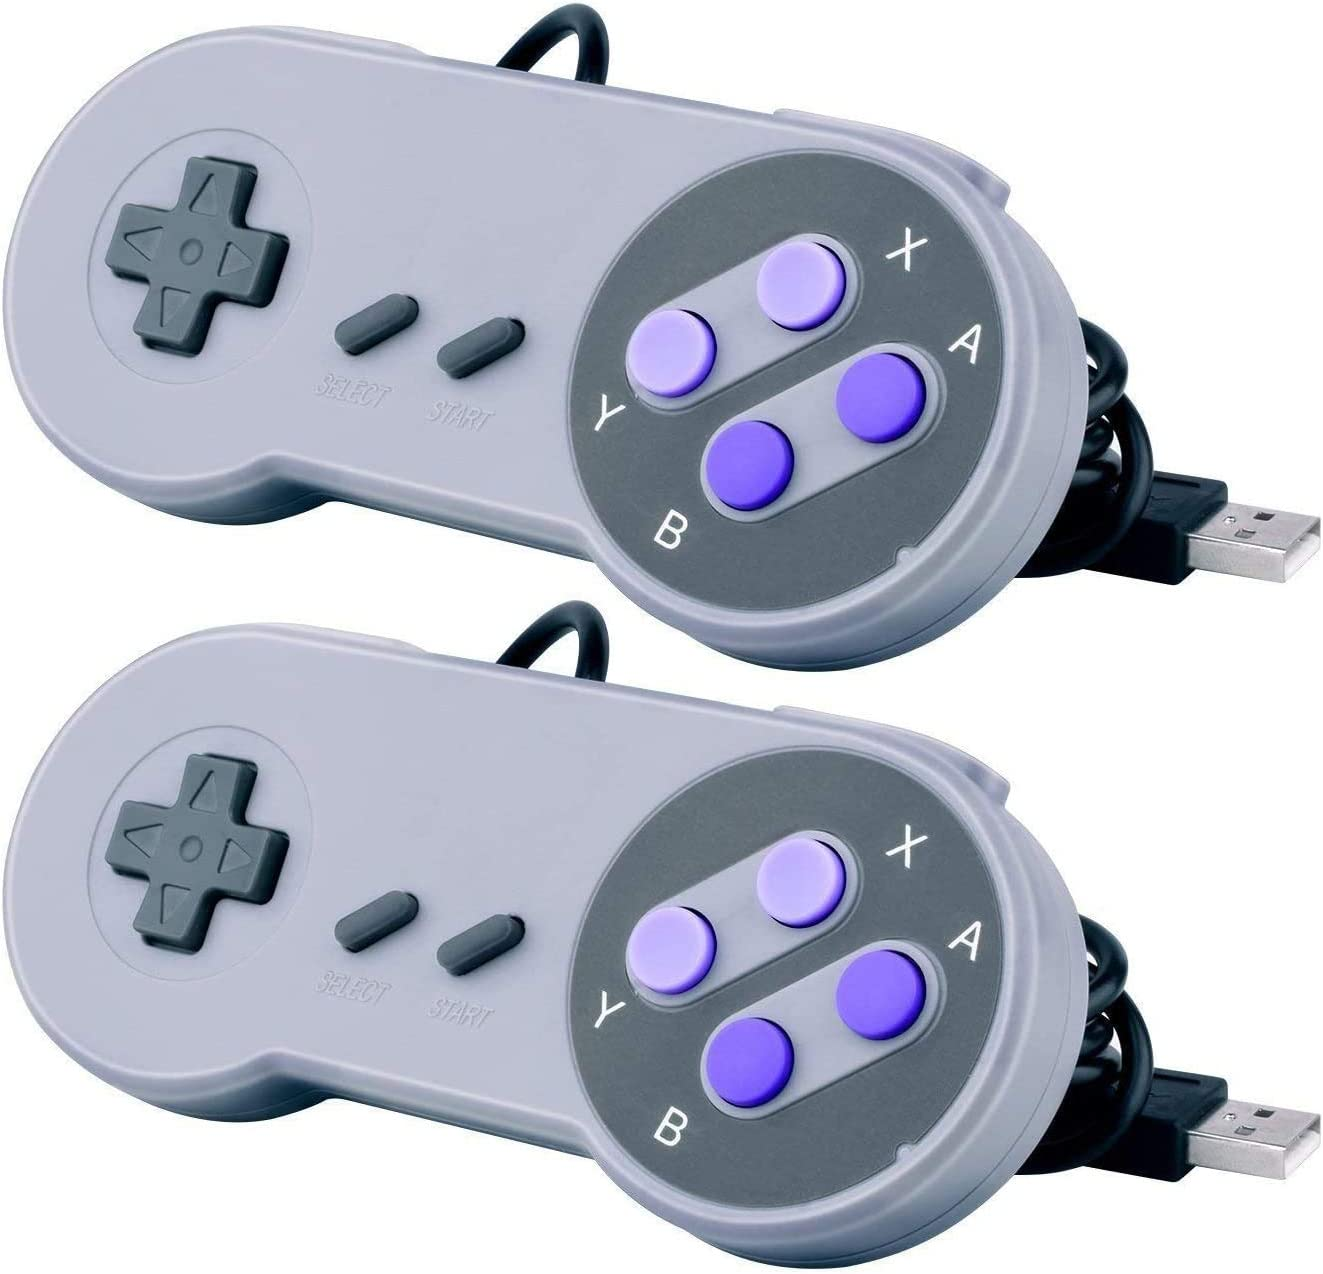 Bundle 2 pcs USB Controller for Classic Super Nintendo NES SNES, USB Famicom Controller Joypad Gamepad for Laptop Computer Windows PC/MAC/Raspberry Pi